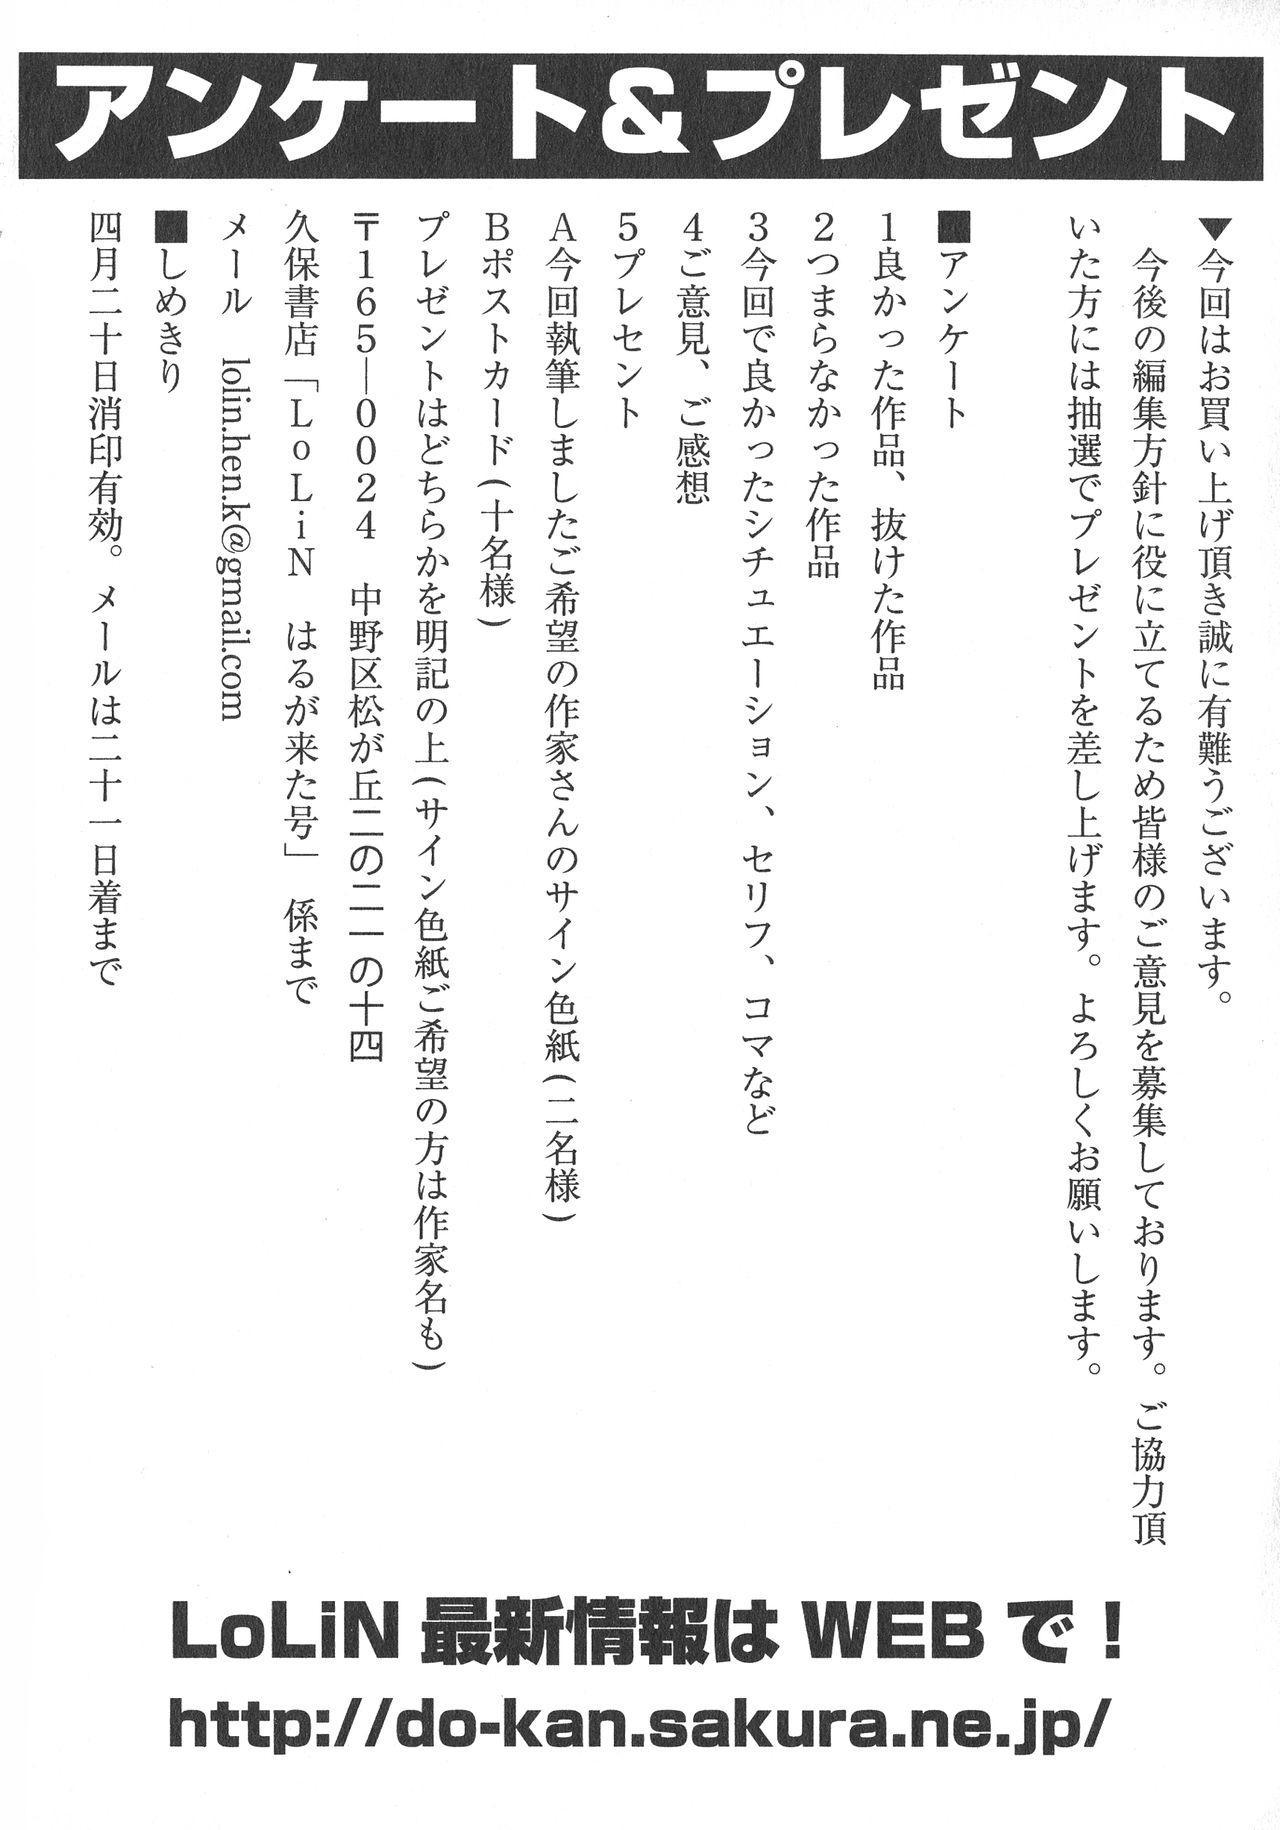 LoLiN Ameiro no Tokigo 149